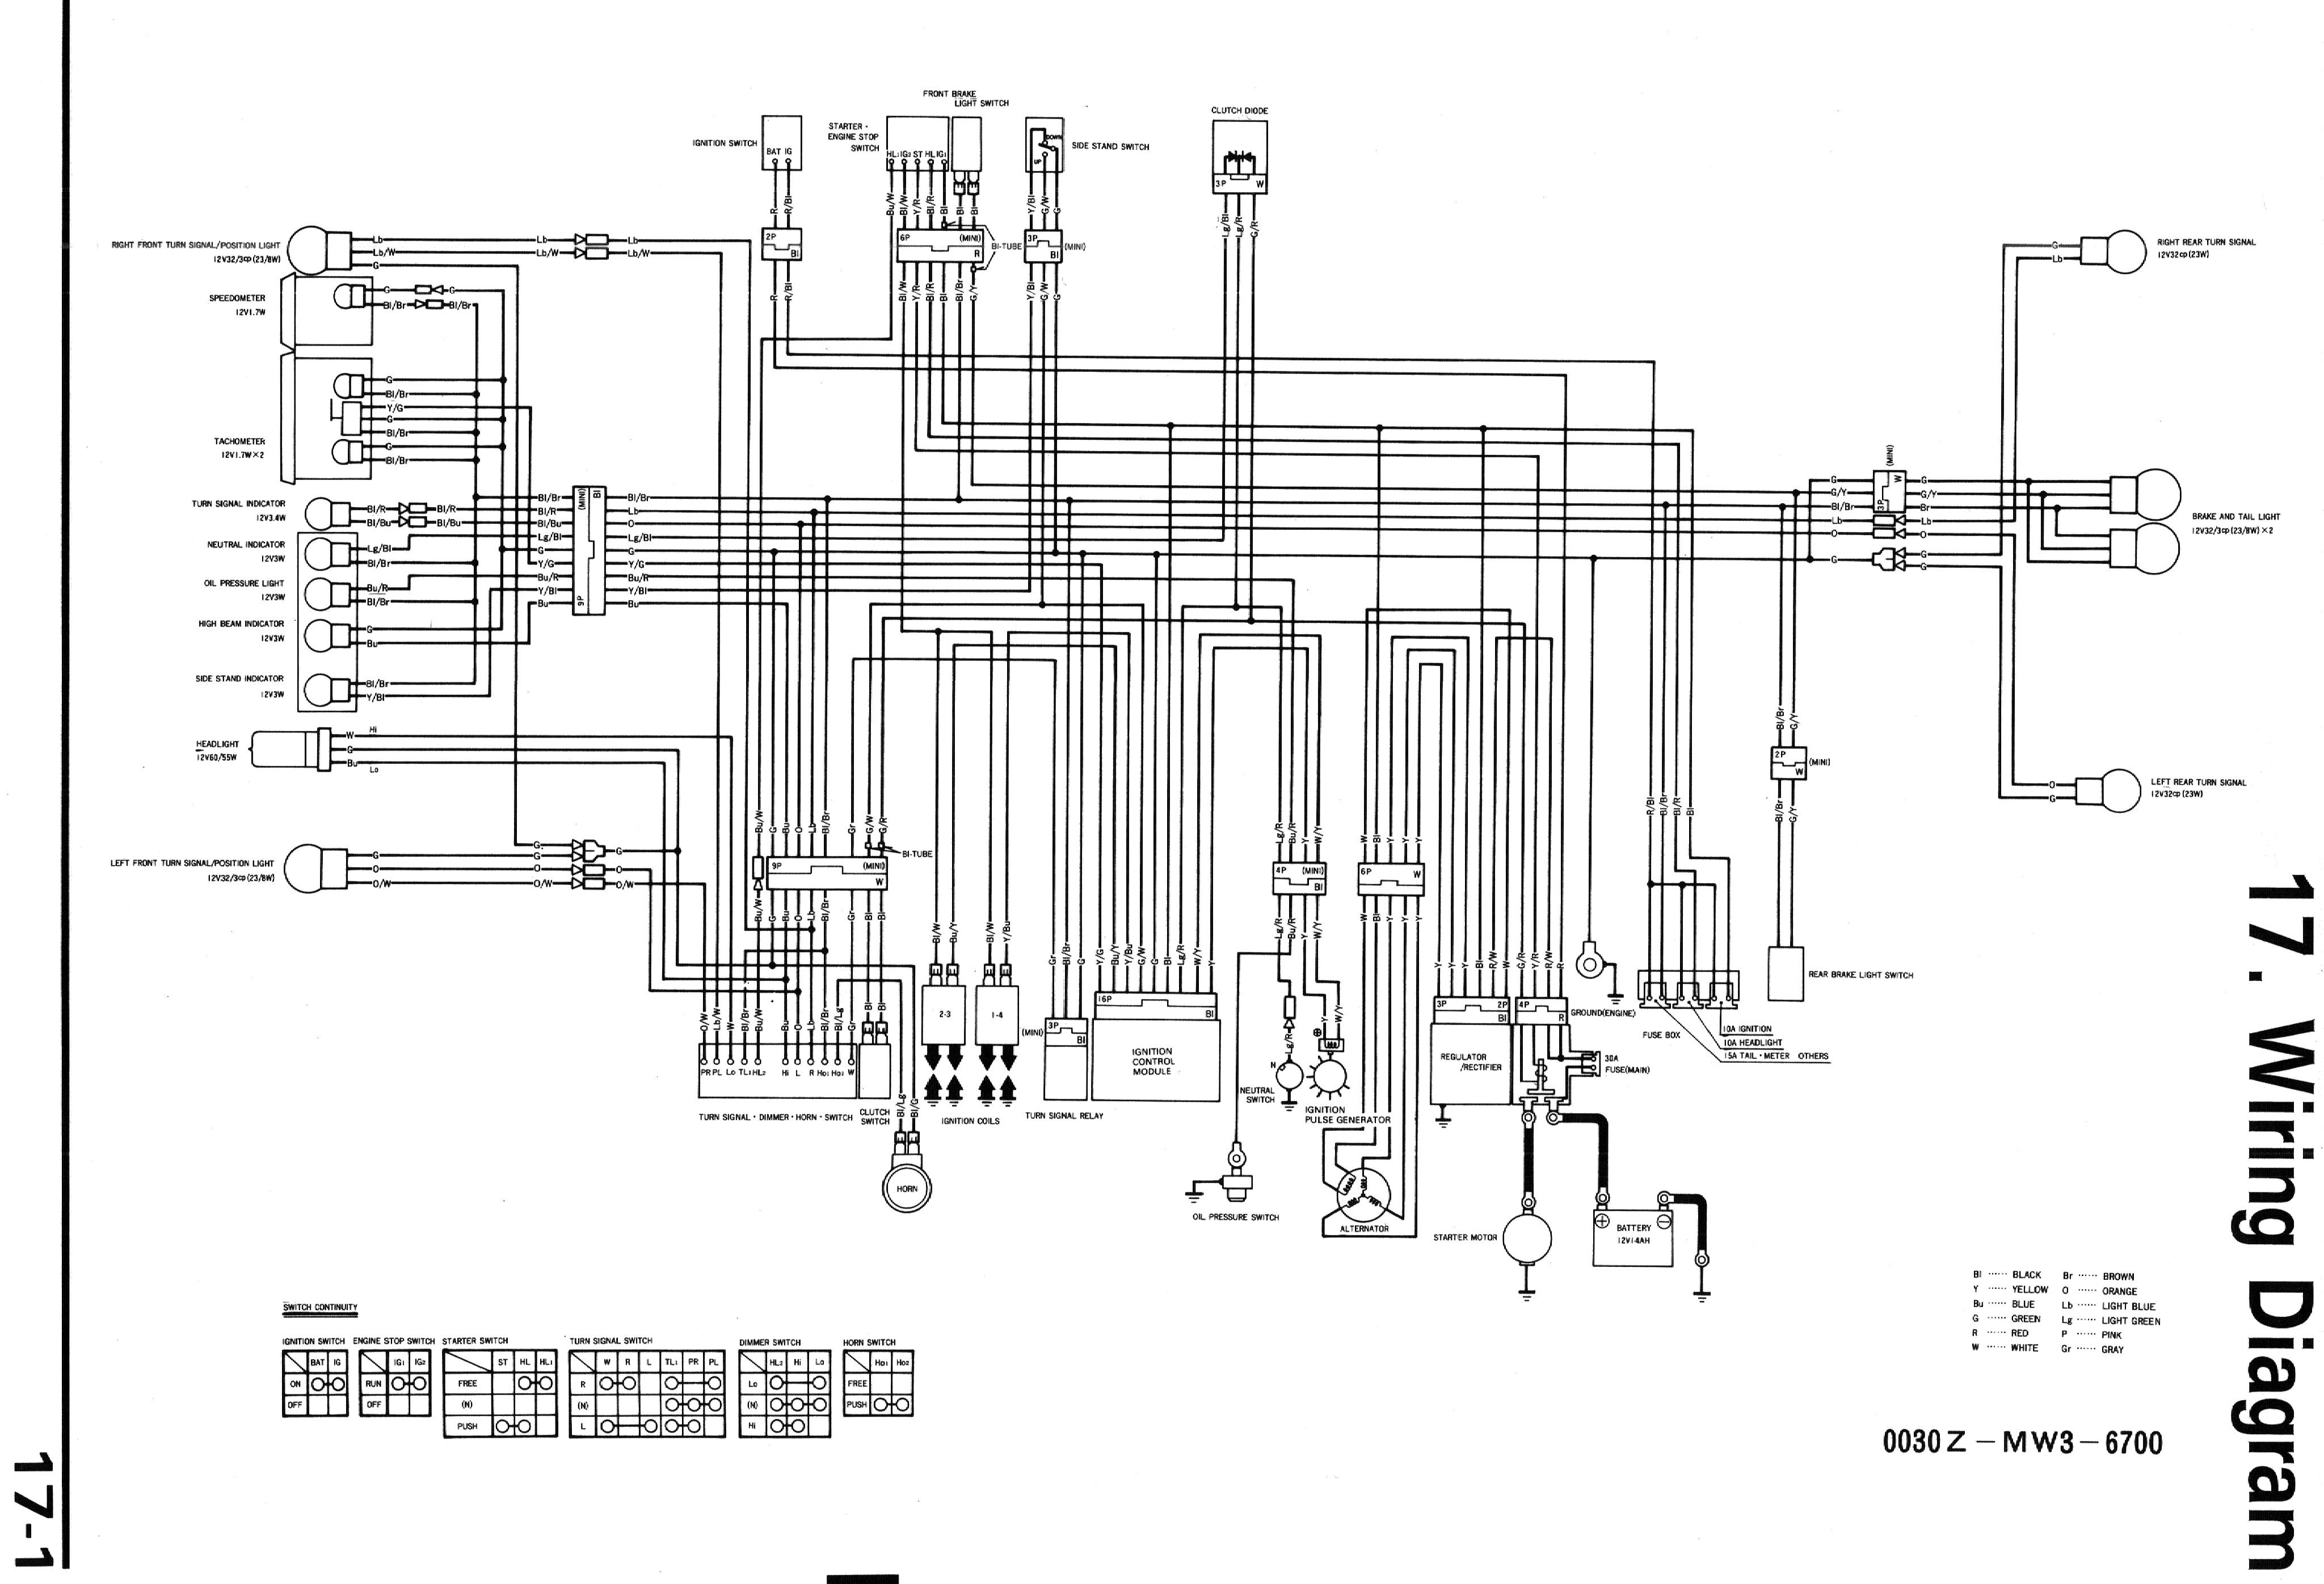 cb750 wiring diagram wiring diagram image cb 750 engine diagram honda cb750 wiring diagrams